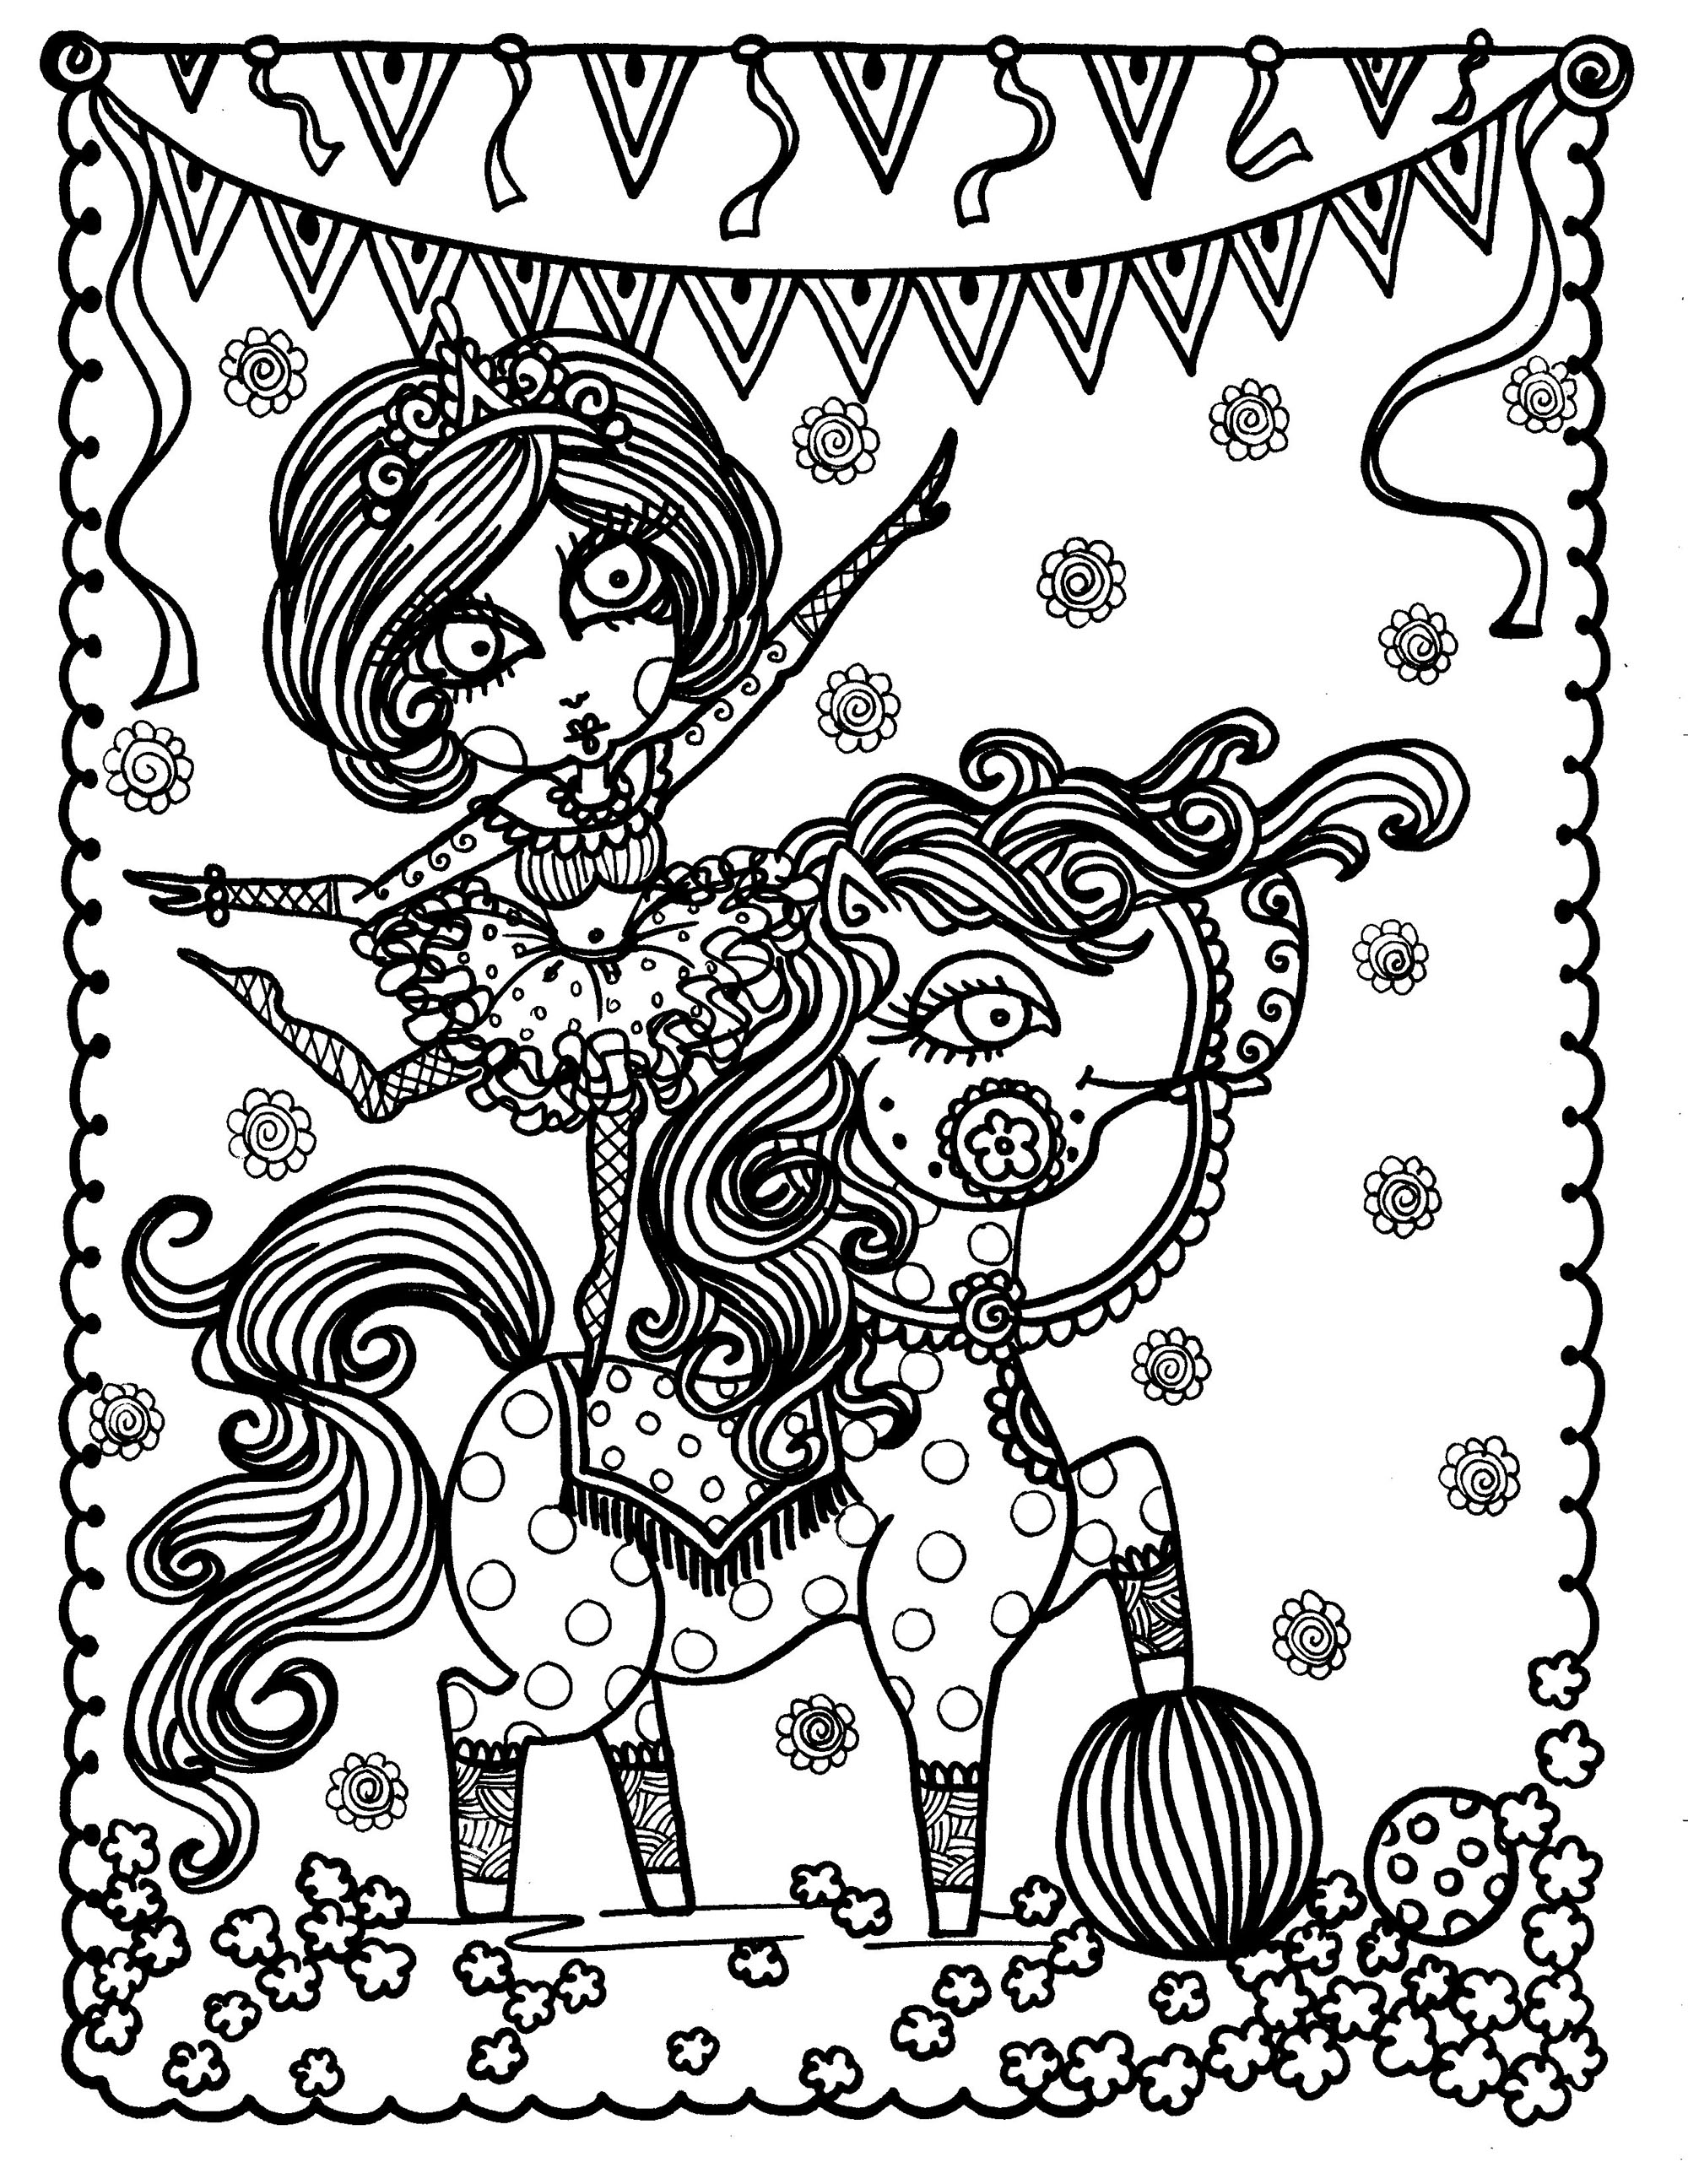 Acrobat girl on horse, Artist : Deborah Muller